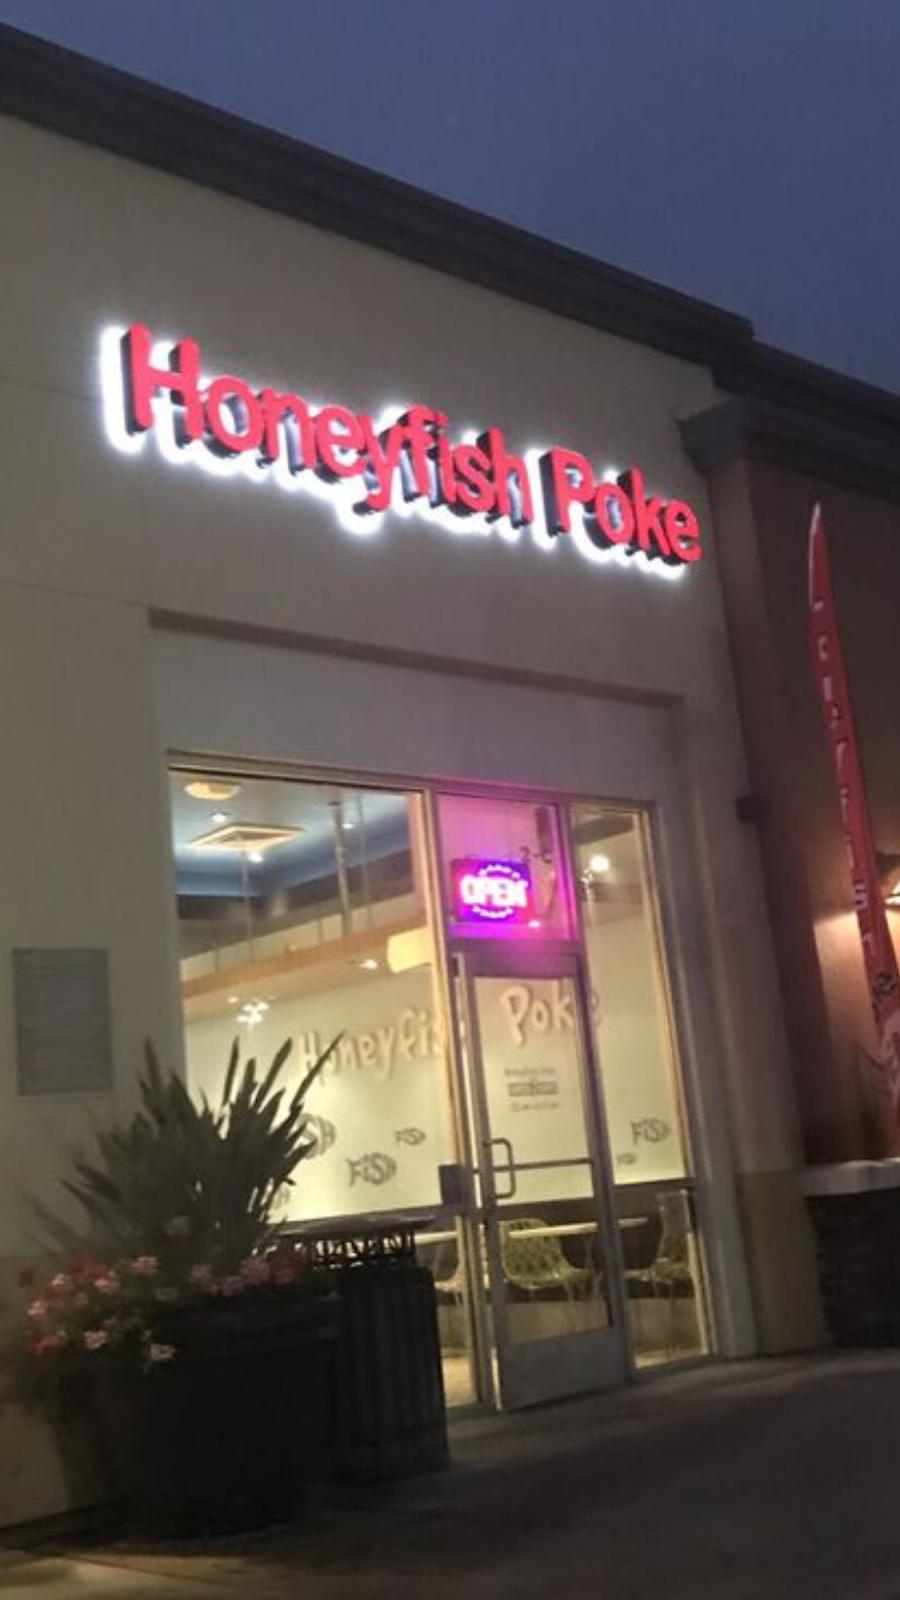 Honeyfish Poke | restaurant | 1040 W Imperial Hwy Suite 2C, La Habra, CA 90631, USA | 7146803602 OR +1 714-680-3602